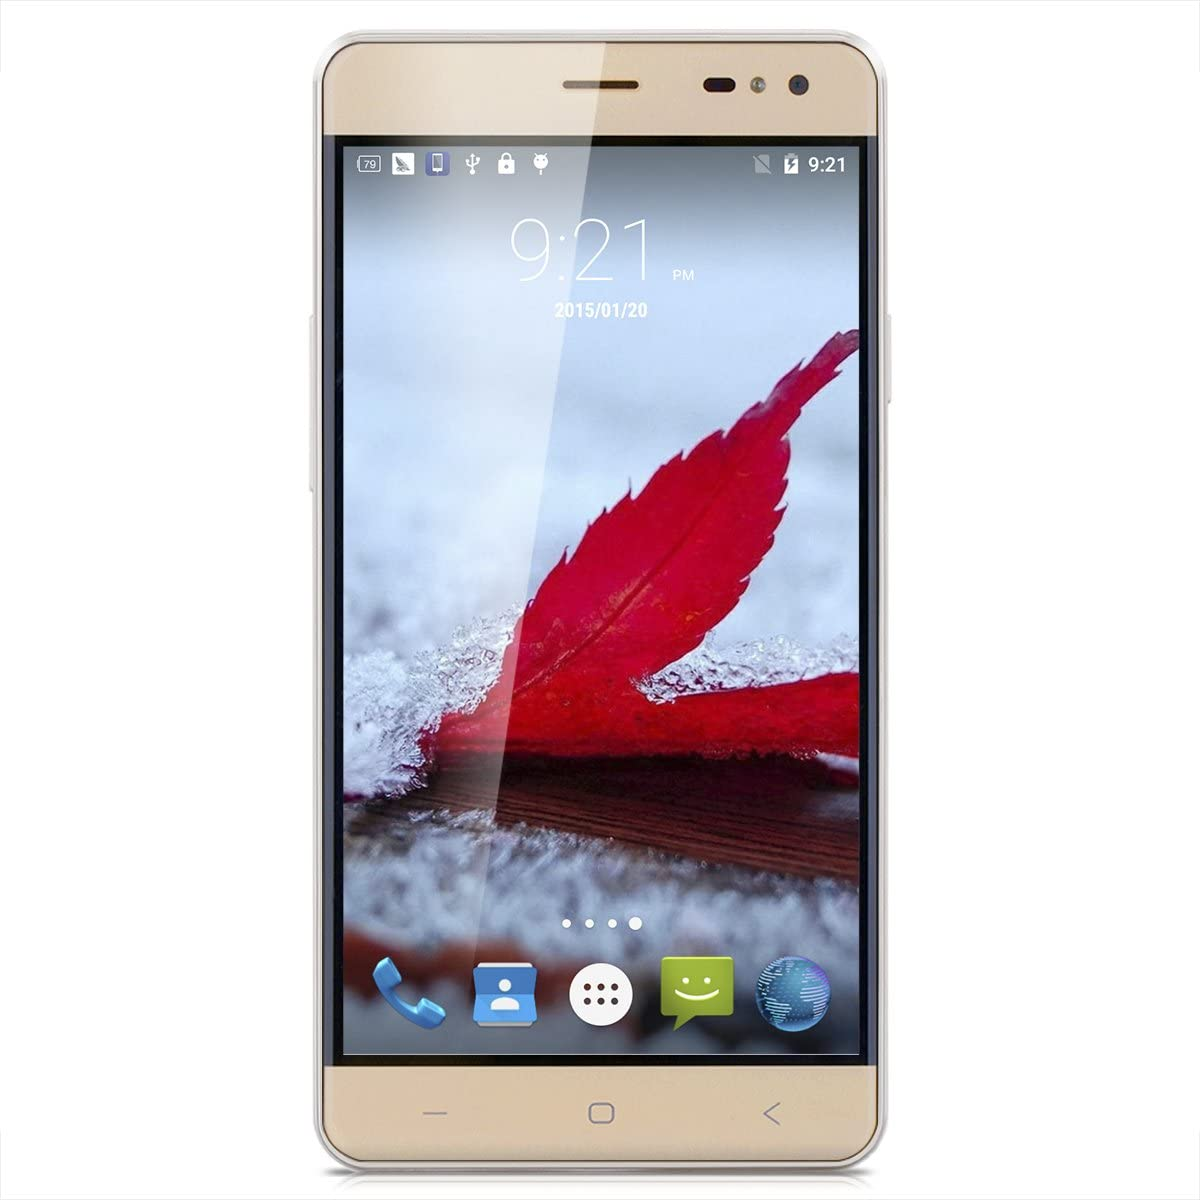 vkworld G1 5.5 IPS 4 G LTE Smartphone 3 GB RAM + 16 GB ROM 5000 mAh batería Dual sim, sin Contrato 13.0 MP + 8.0MP Dual Cámara Android 5.1 mt6753 Octa